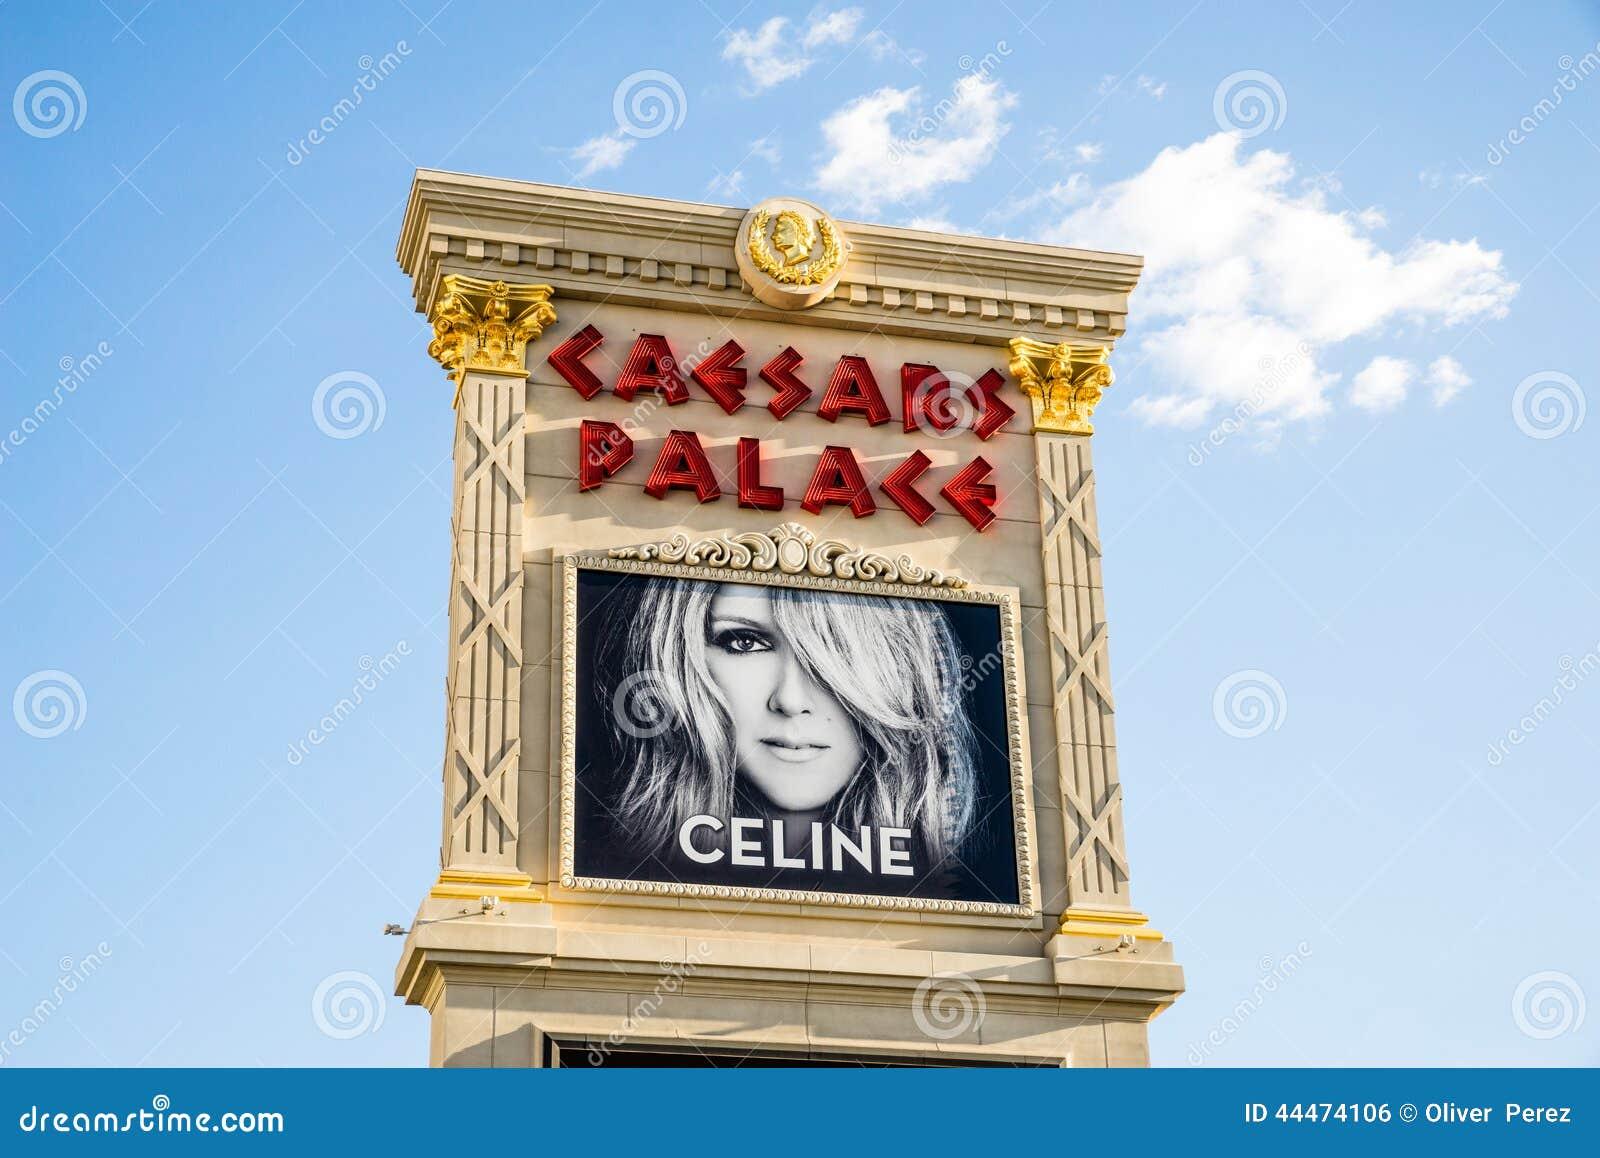 Celine Dion, bij Caesars Palace Las Vegas wordt gekenmerkt dat